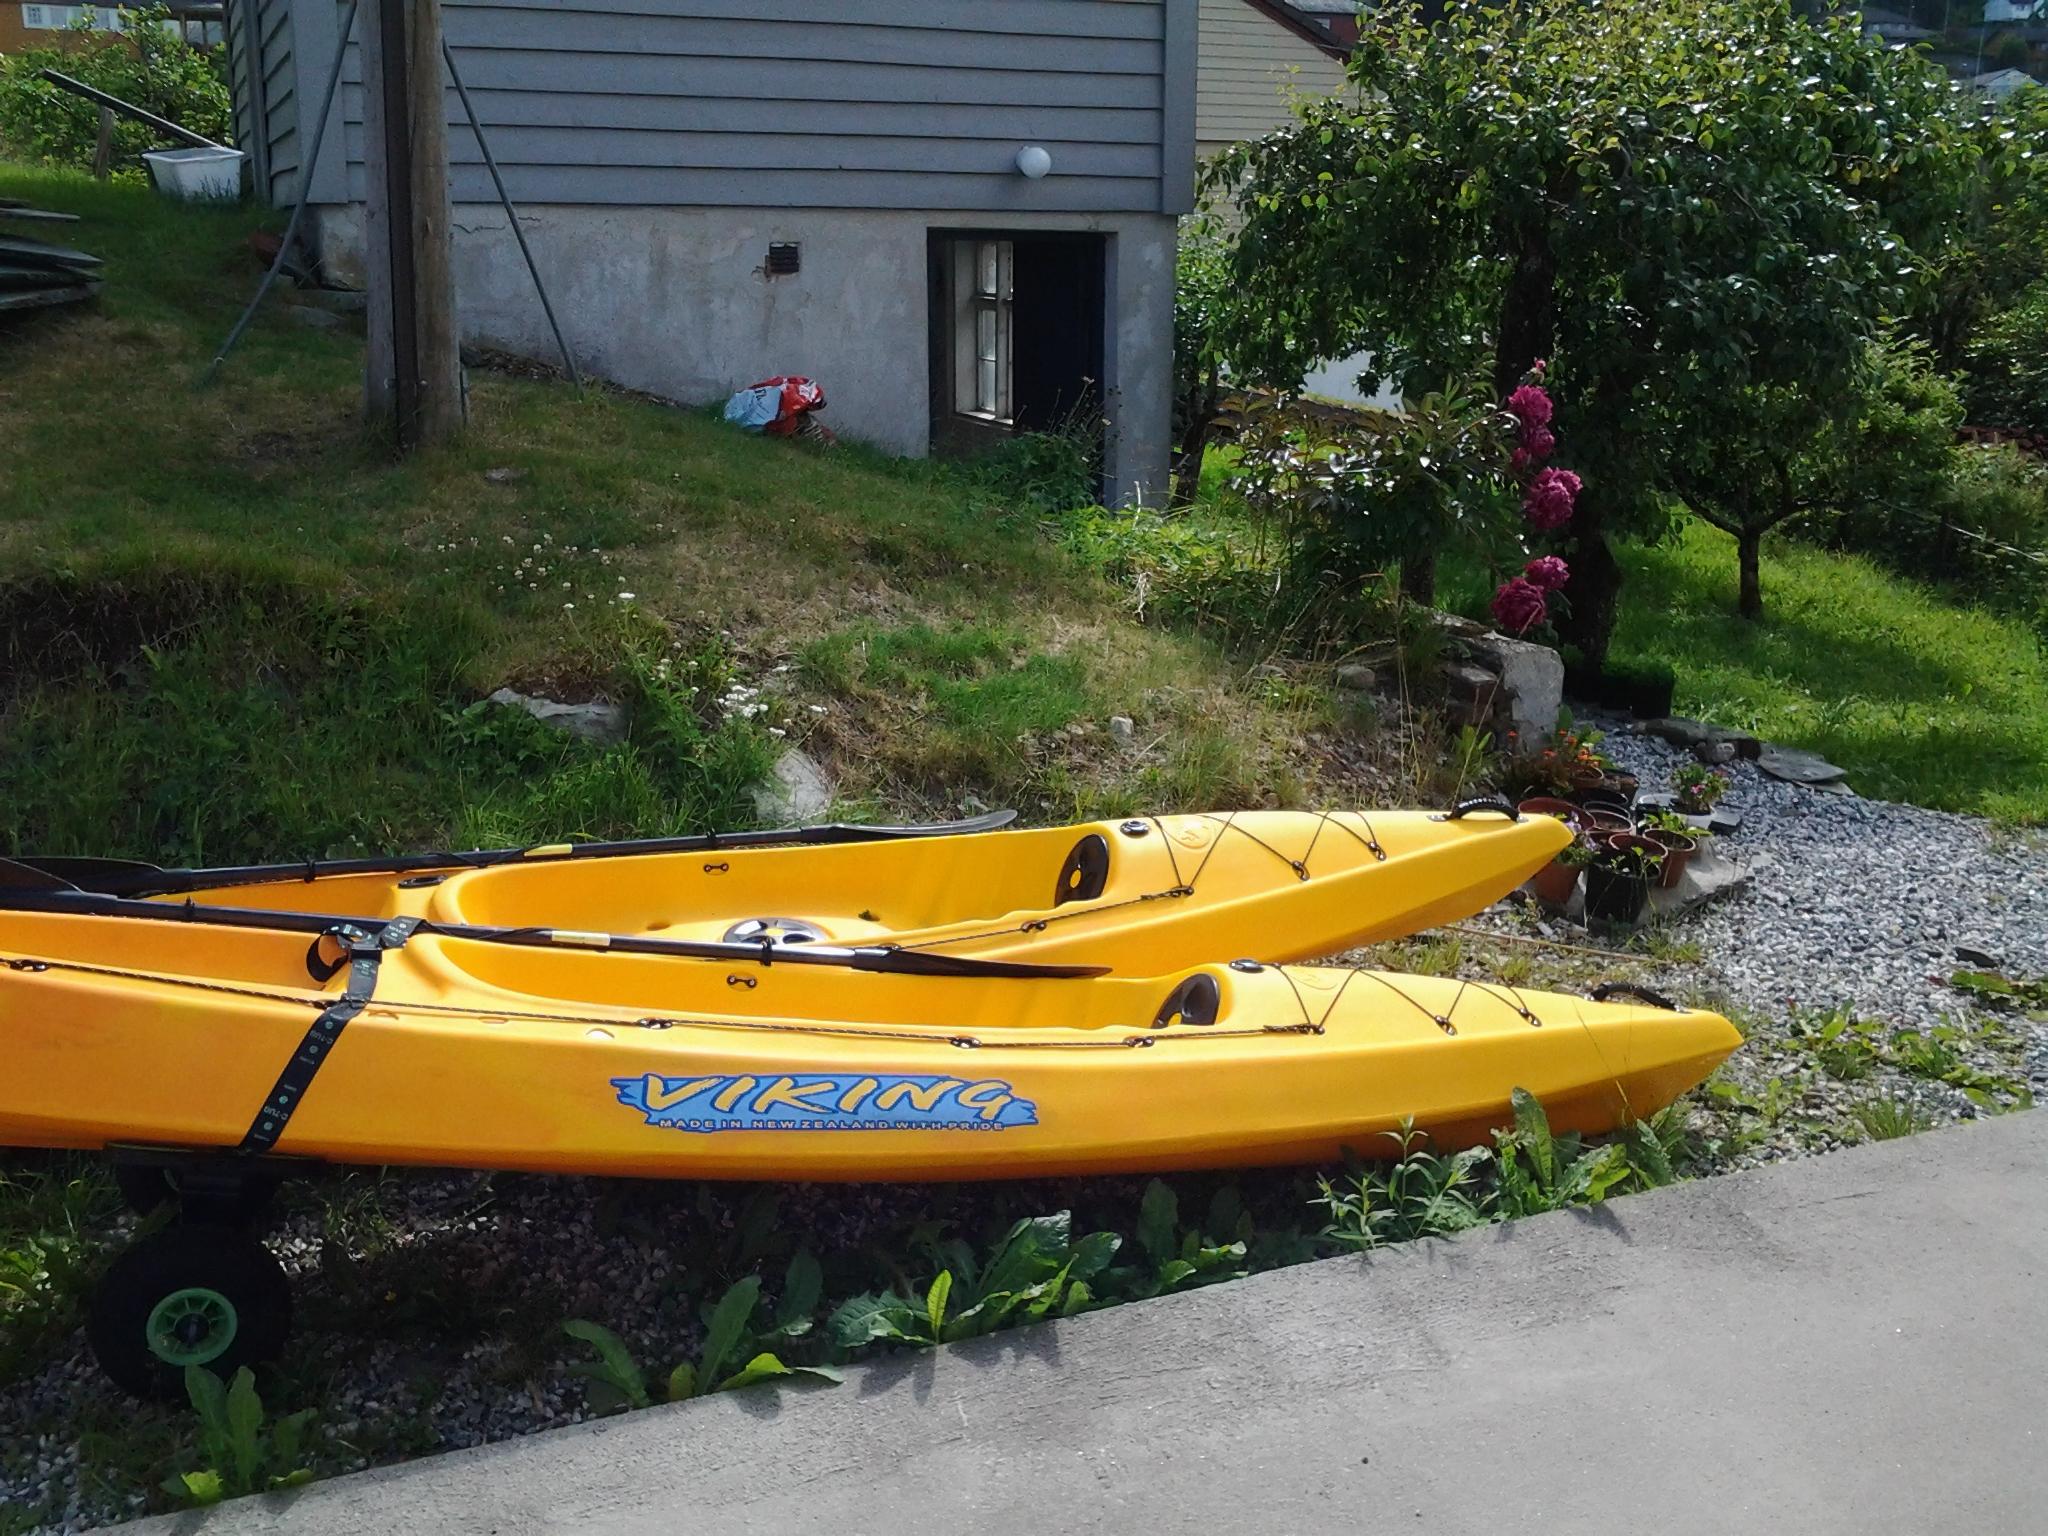 Hardanger Rom & Harmonium rent kayaks